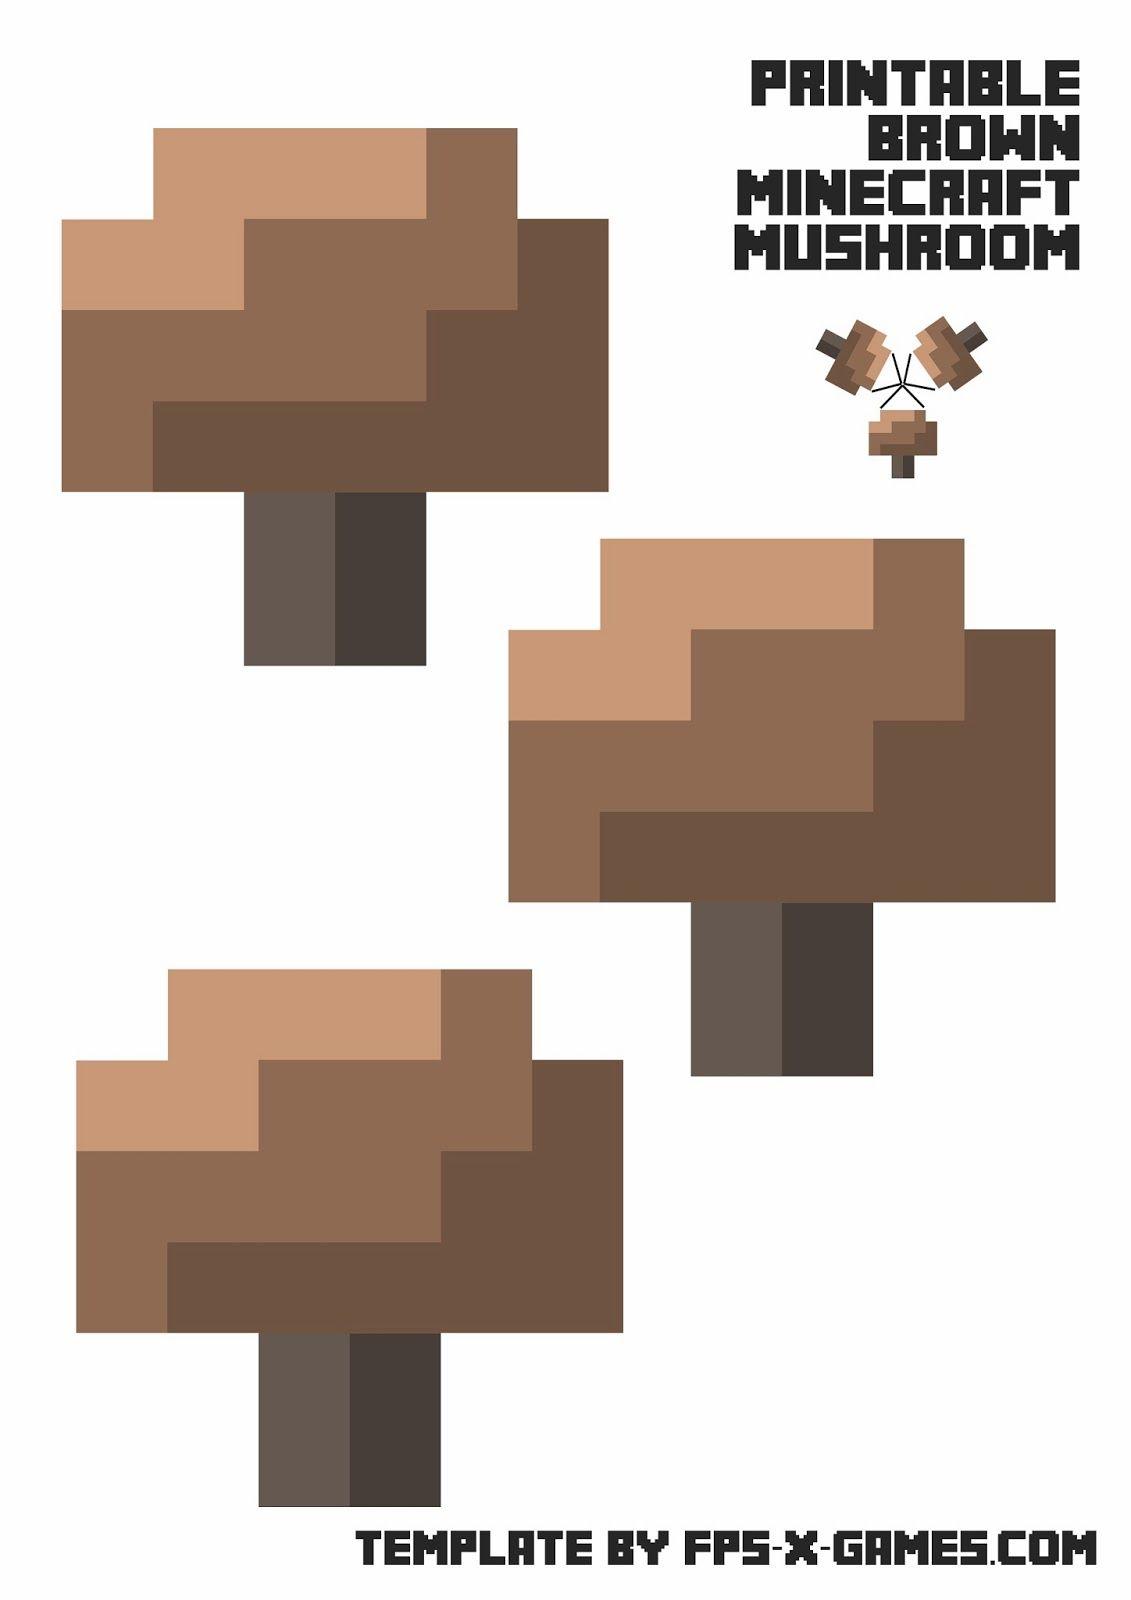 printable papercraft template minecraft mushroom minecraft